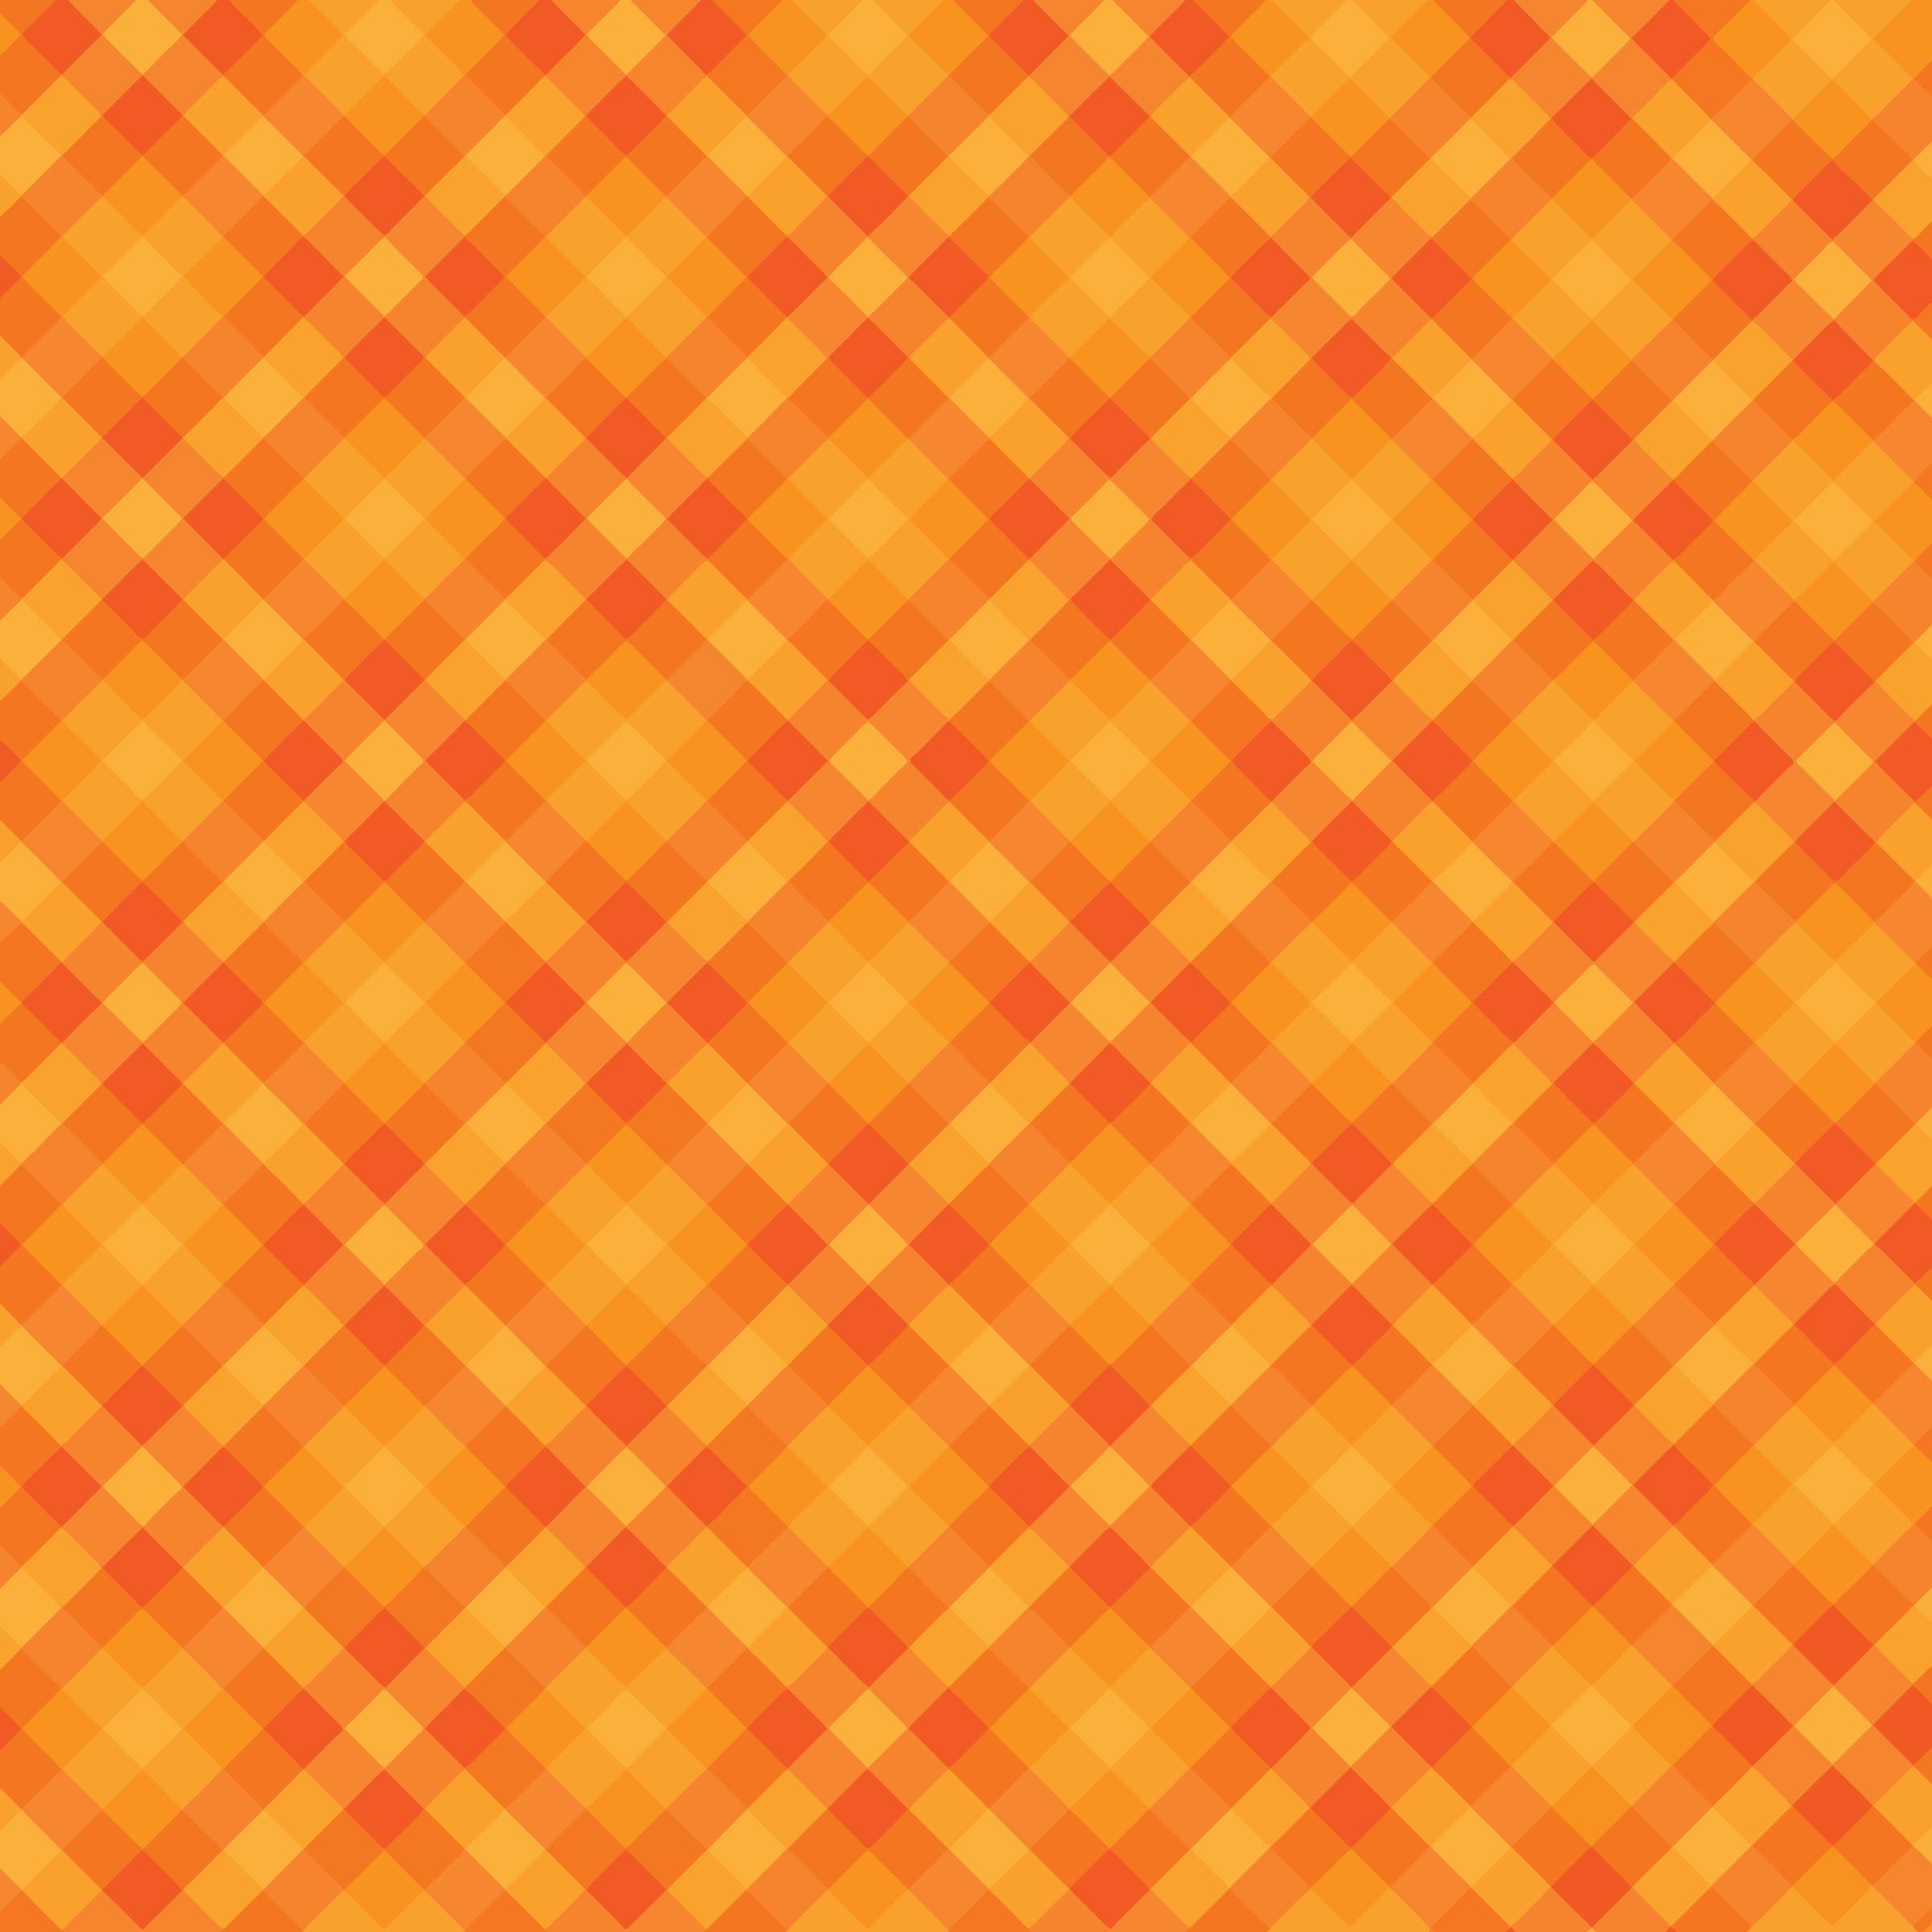 Design clipart orange. Gingham checkered background big